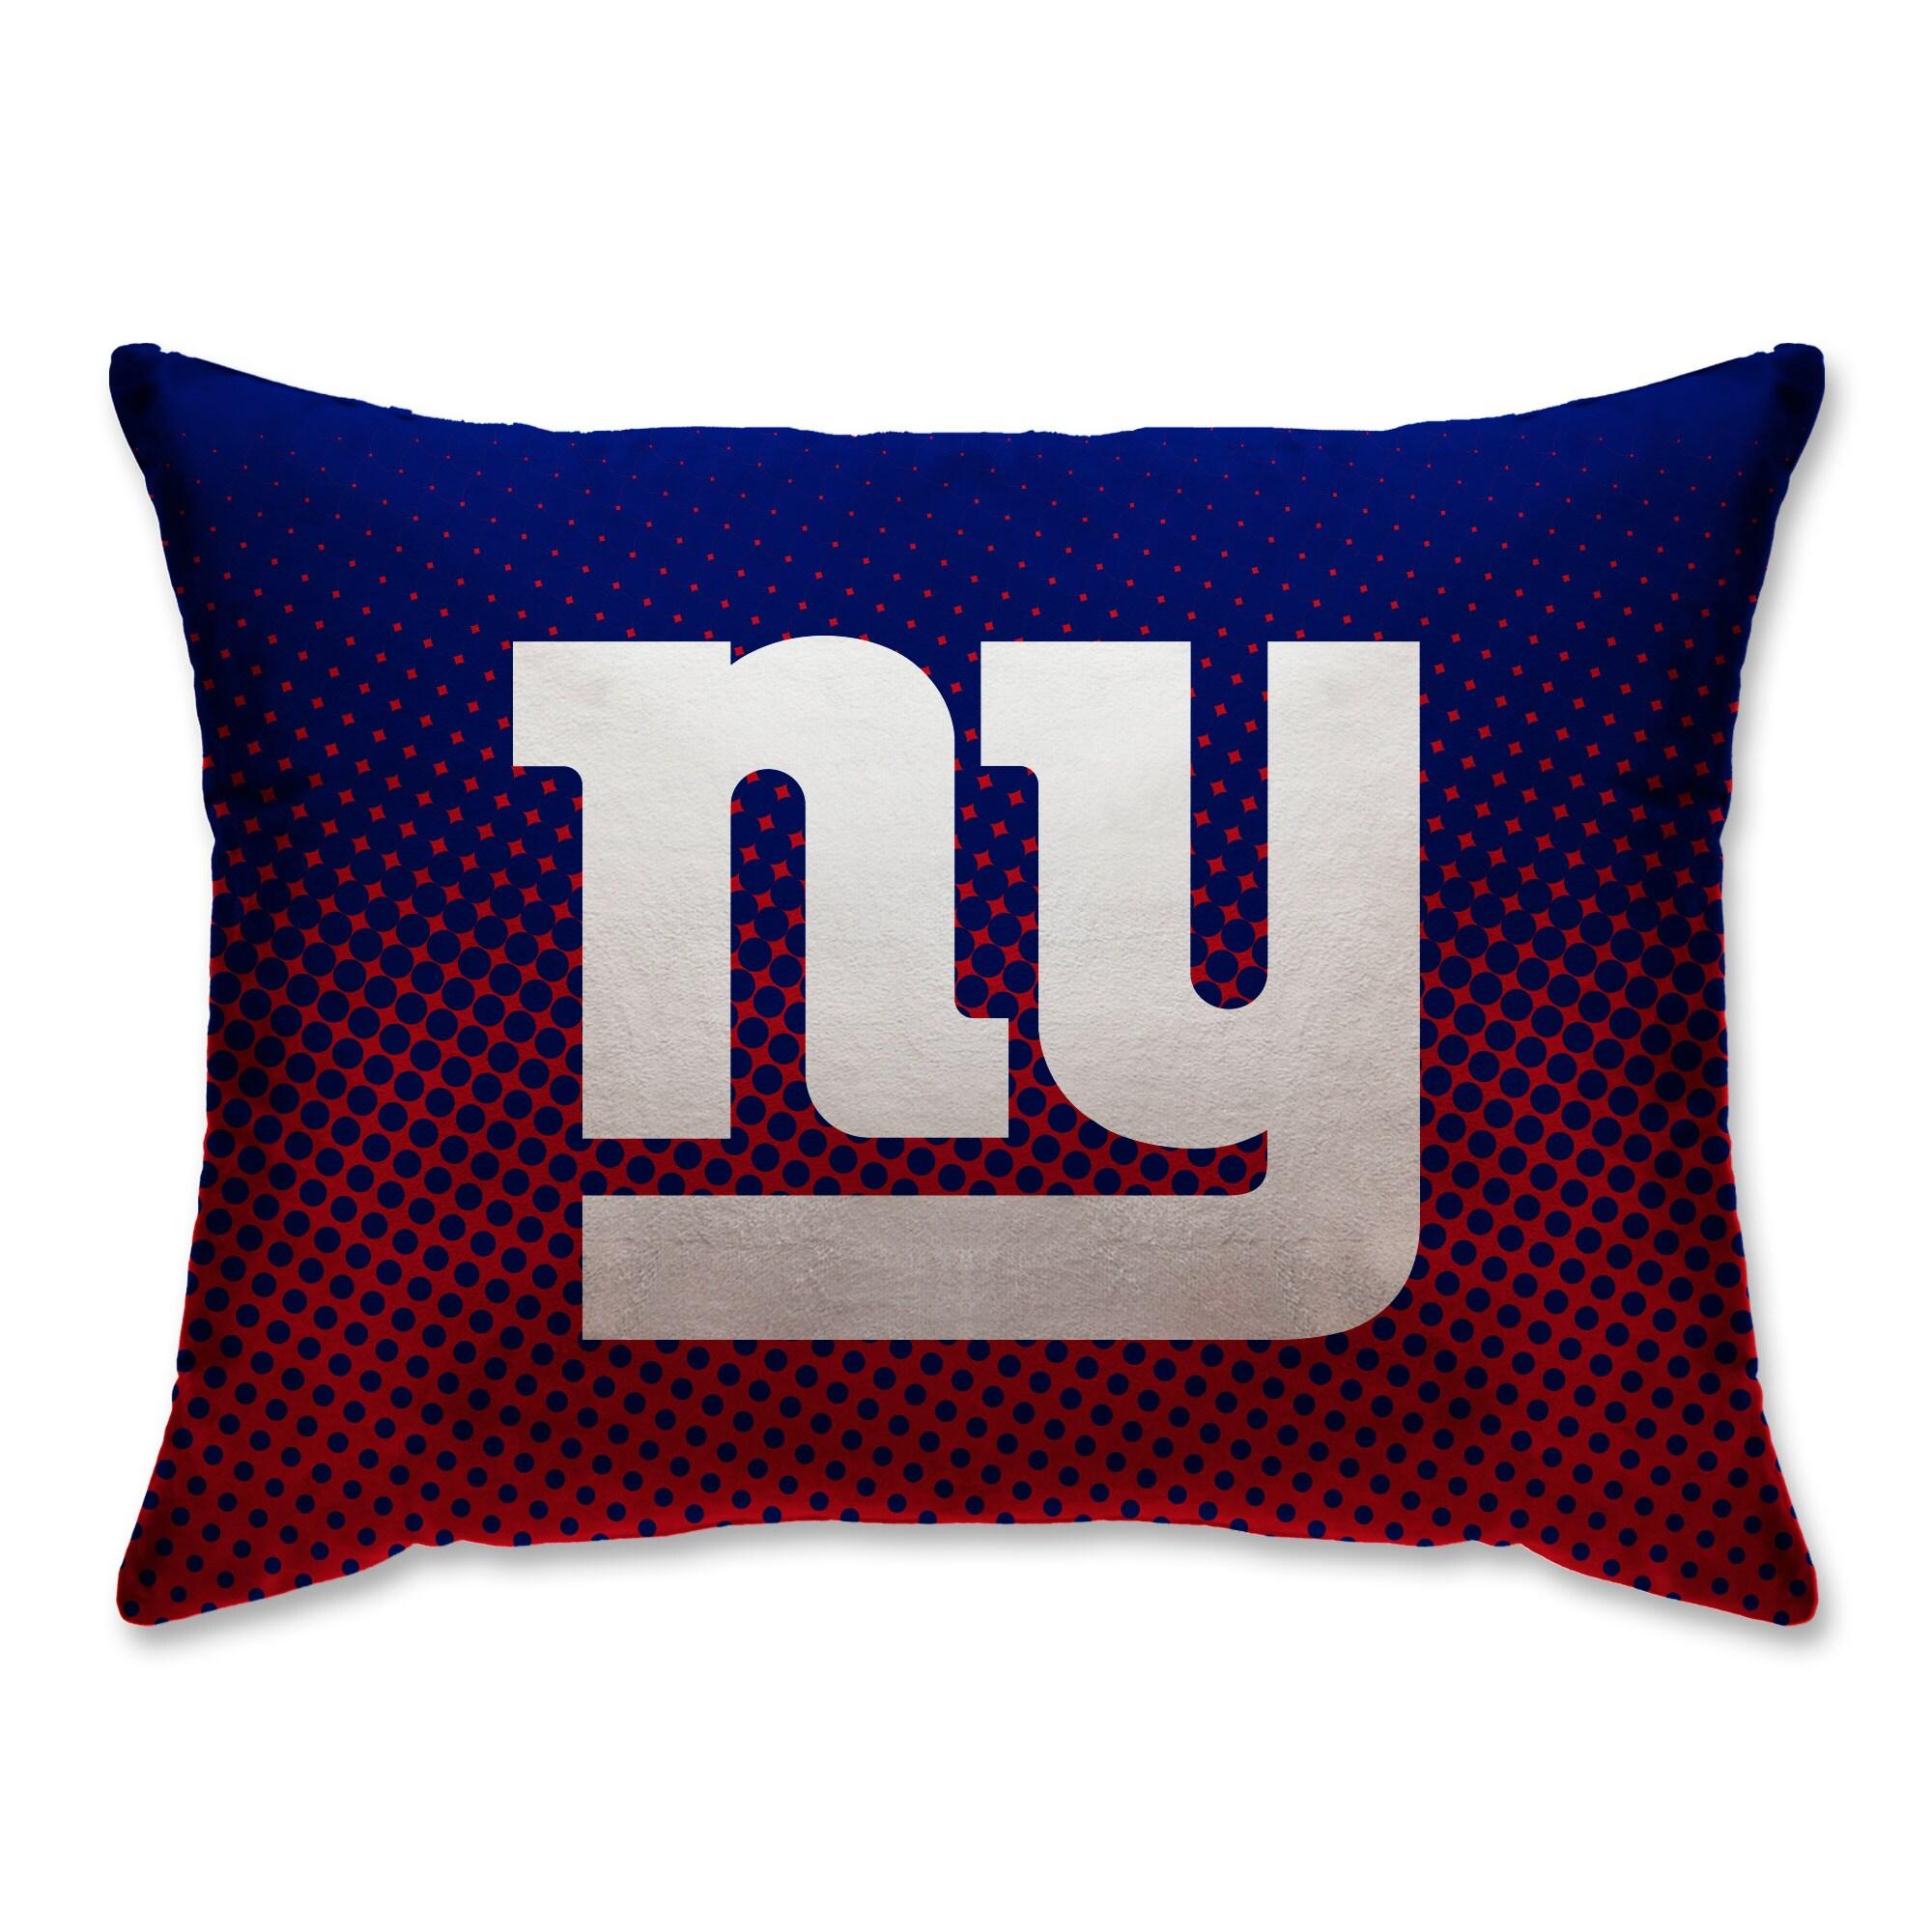 "New York Giants 20"" x 26"" Dot Decorative Bed Pillow"